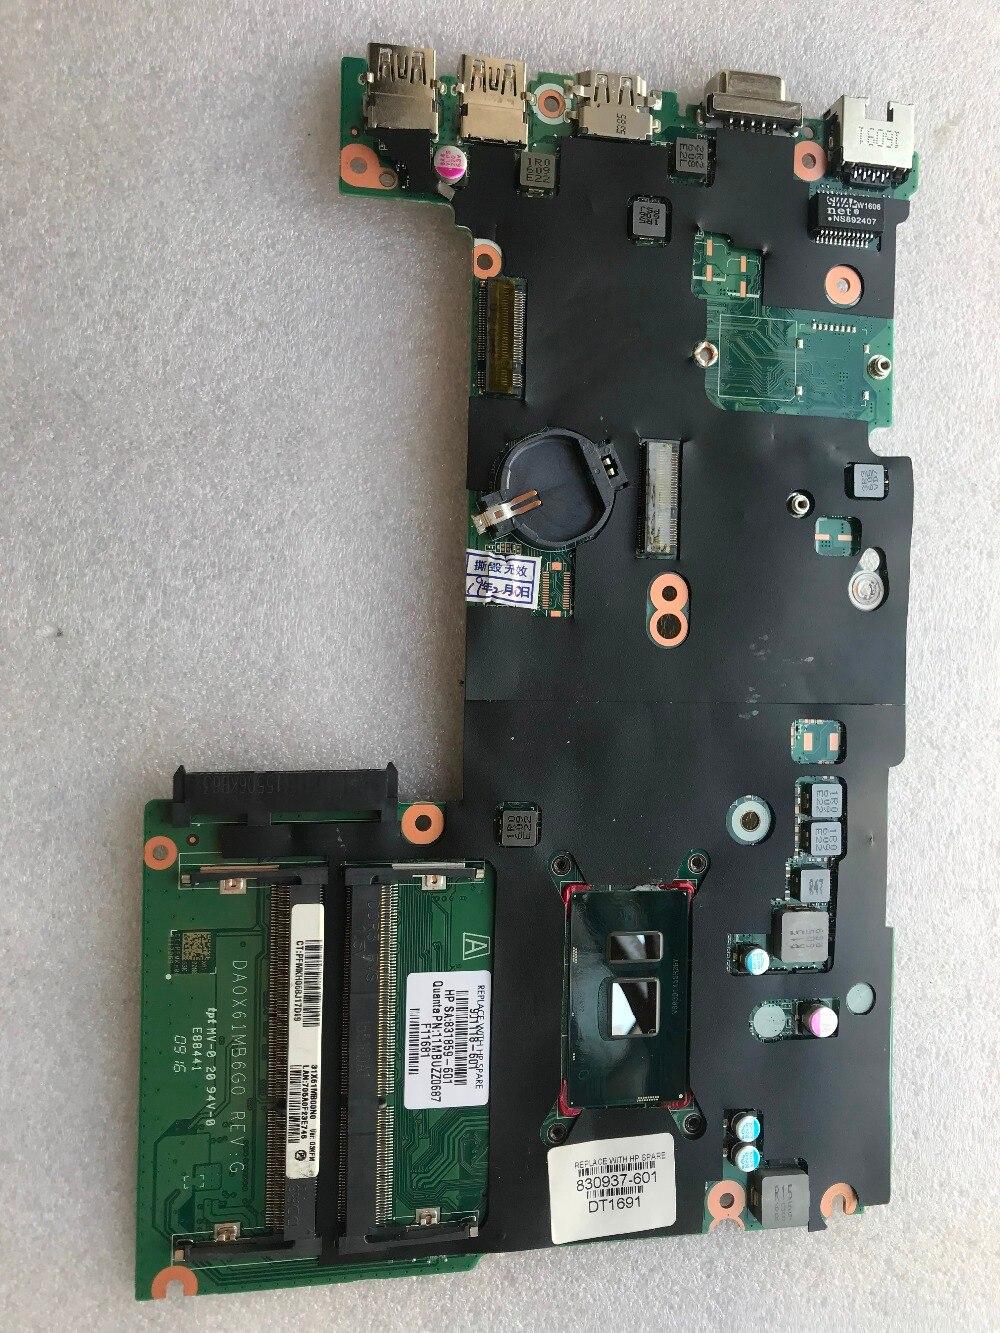 Laptop motherboard para 430 DA0X61MB6G0 G3 440 G3 hp placa principal 830937-601 830937-501 i5-6200U 001 DDR3